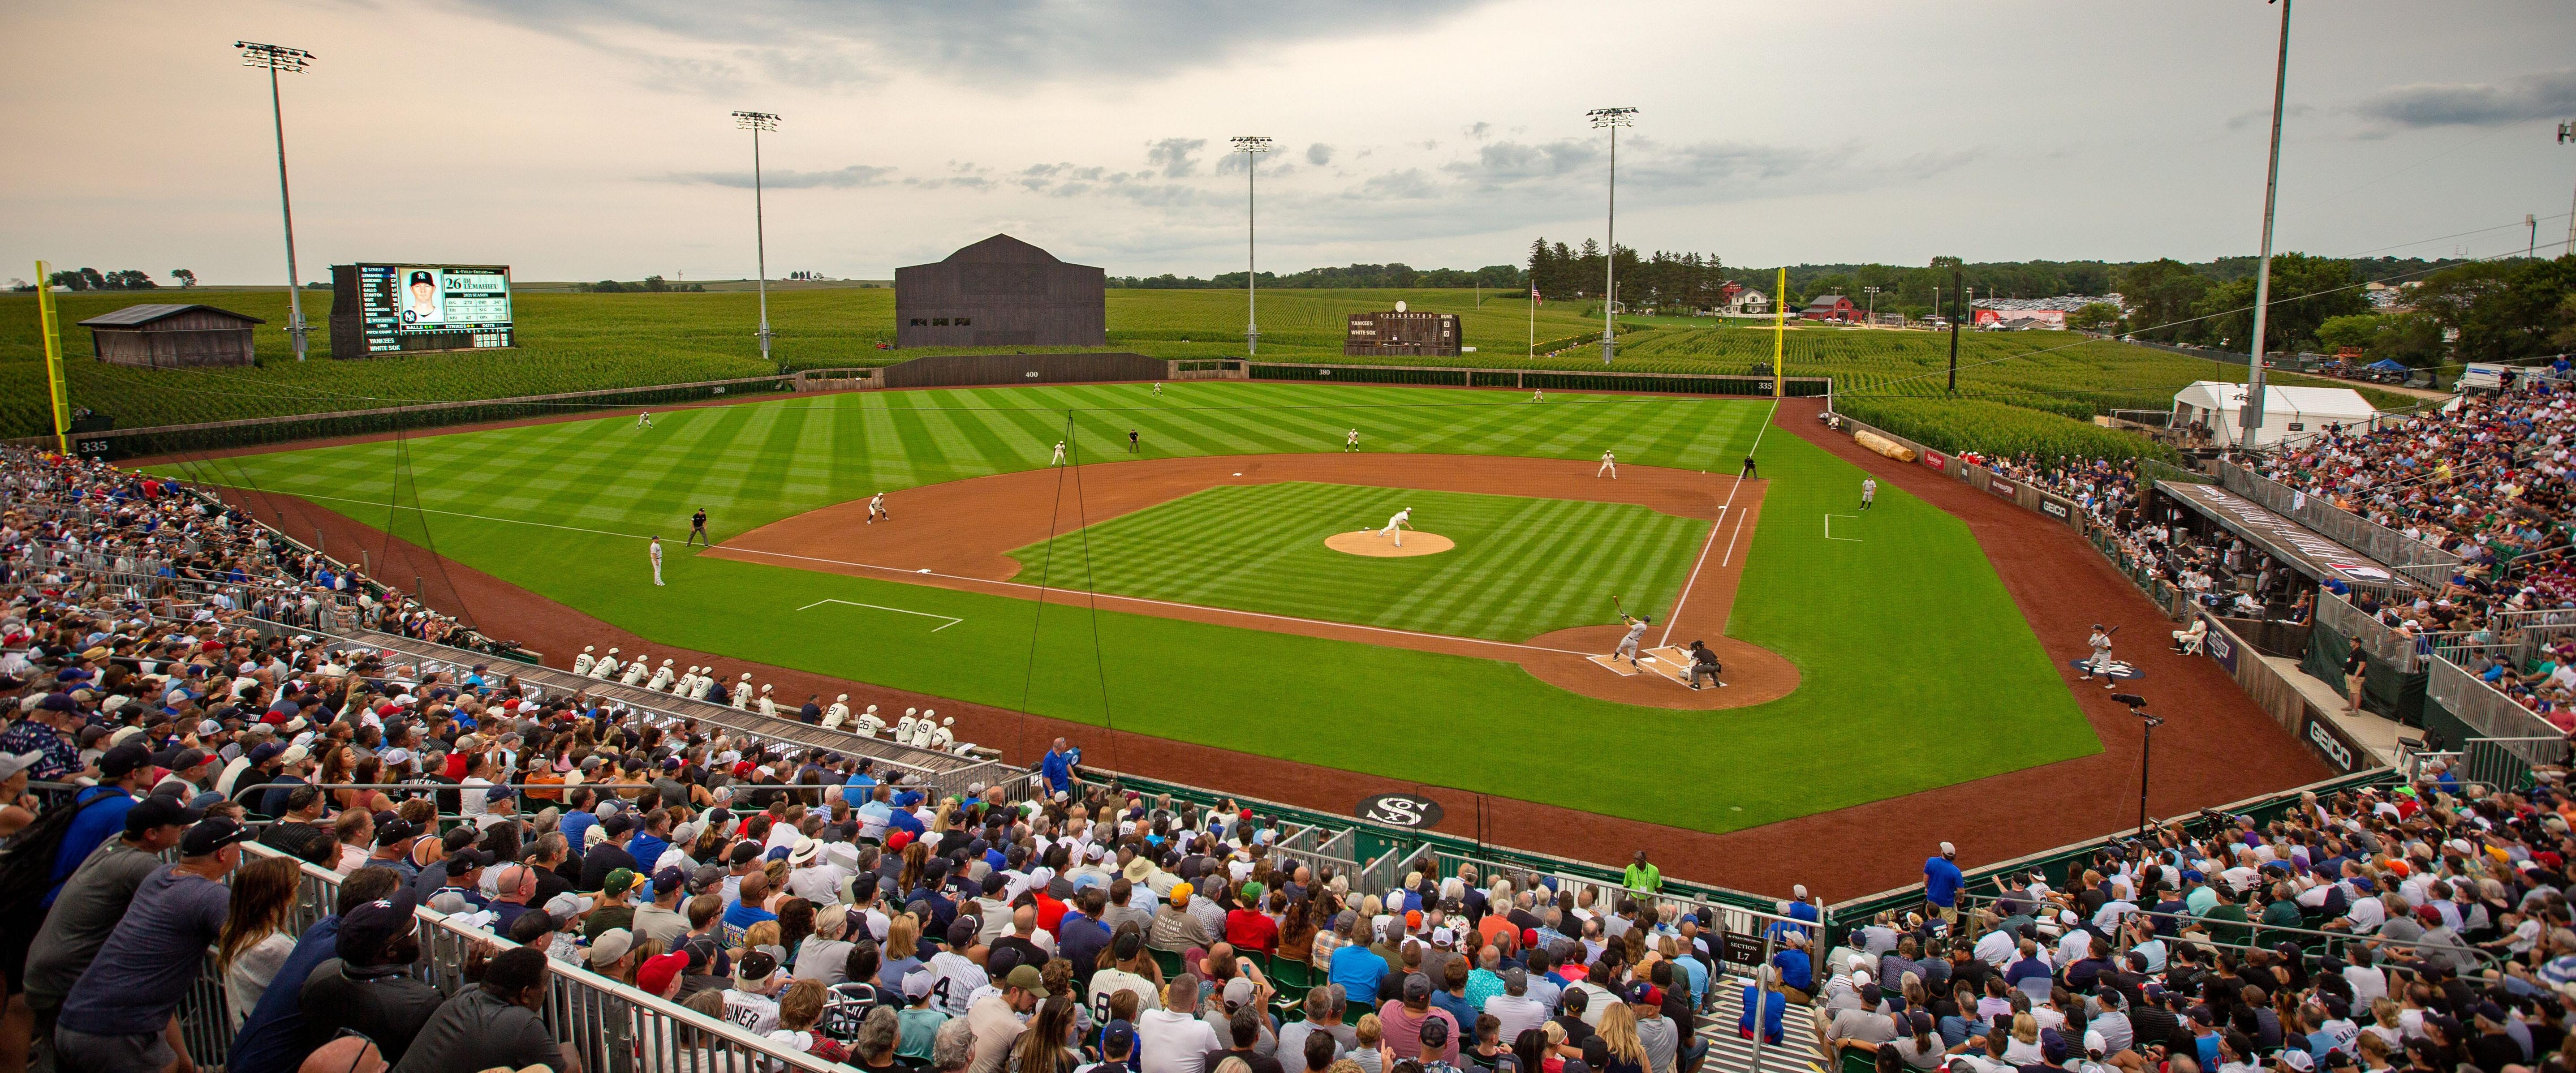 MLB nailed 'The Field of Dreams' Game!